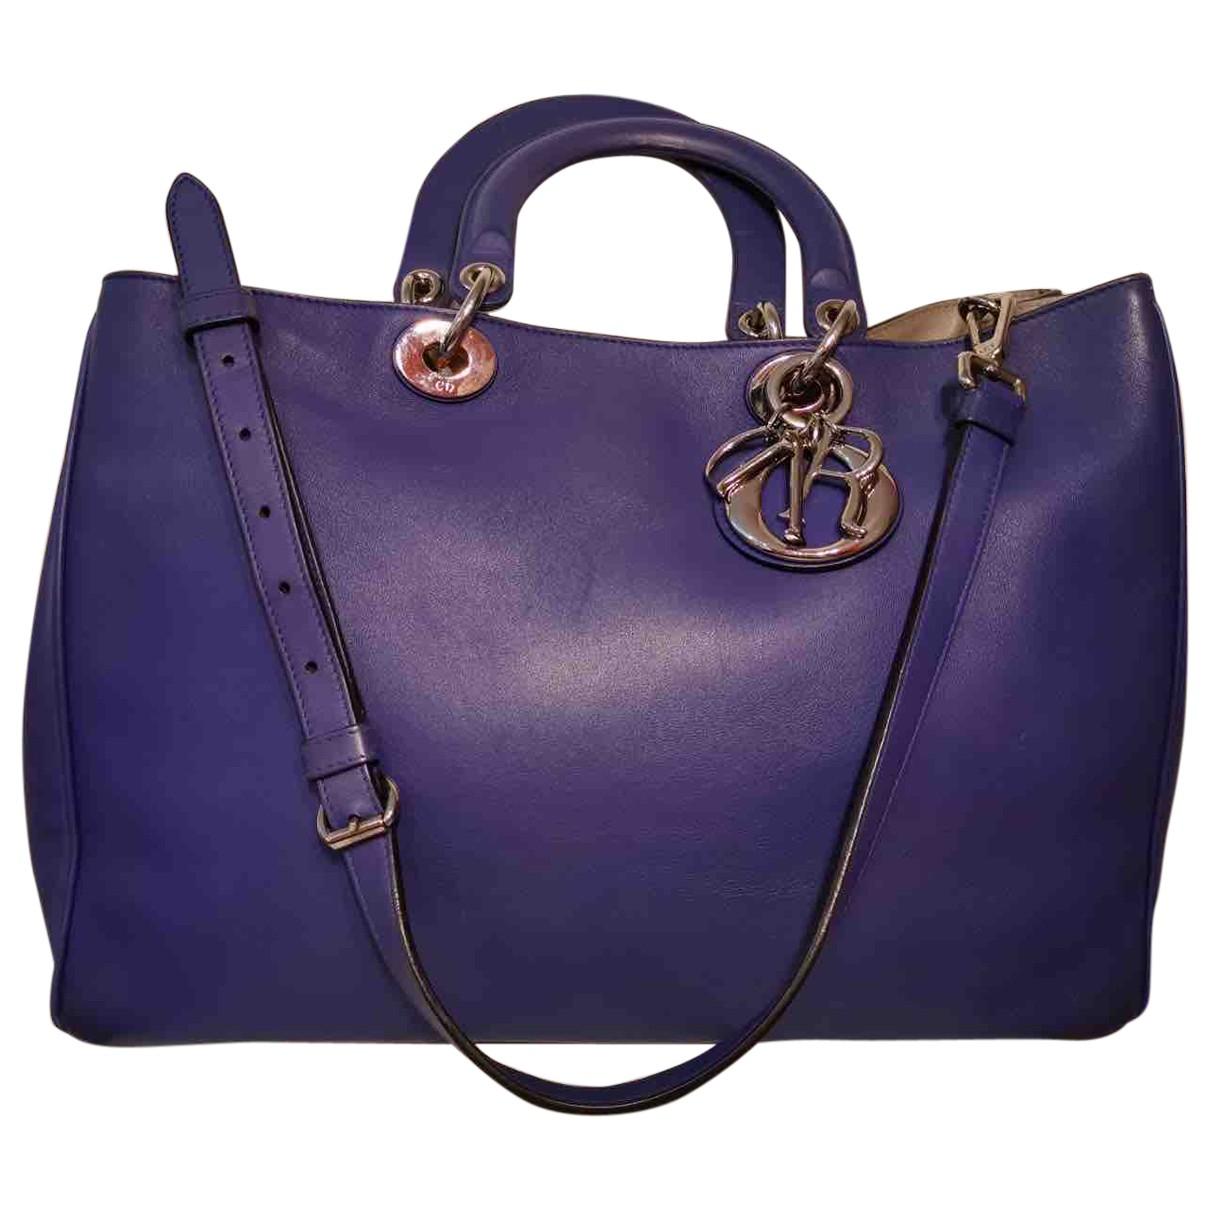 Dior Diorissimo Purple Leather handbag for Women \N